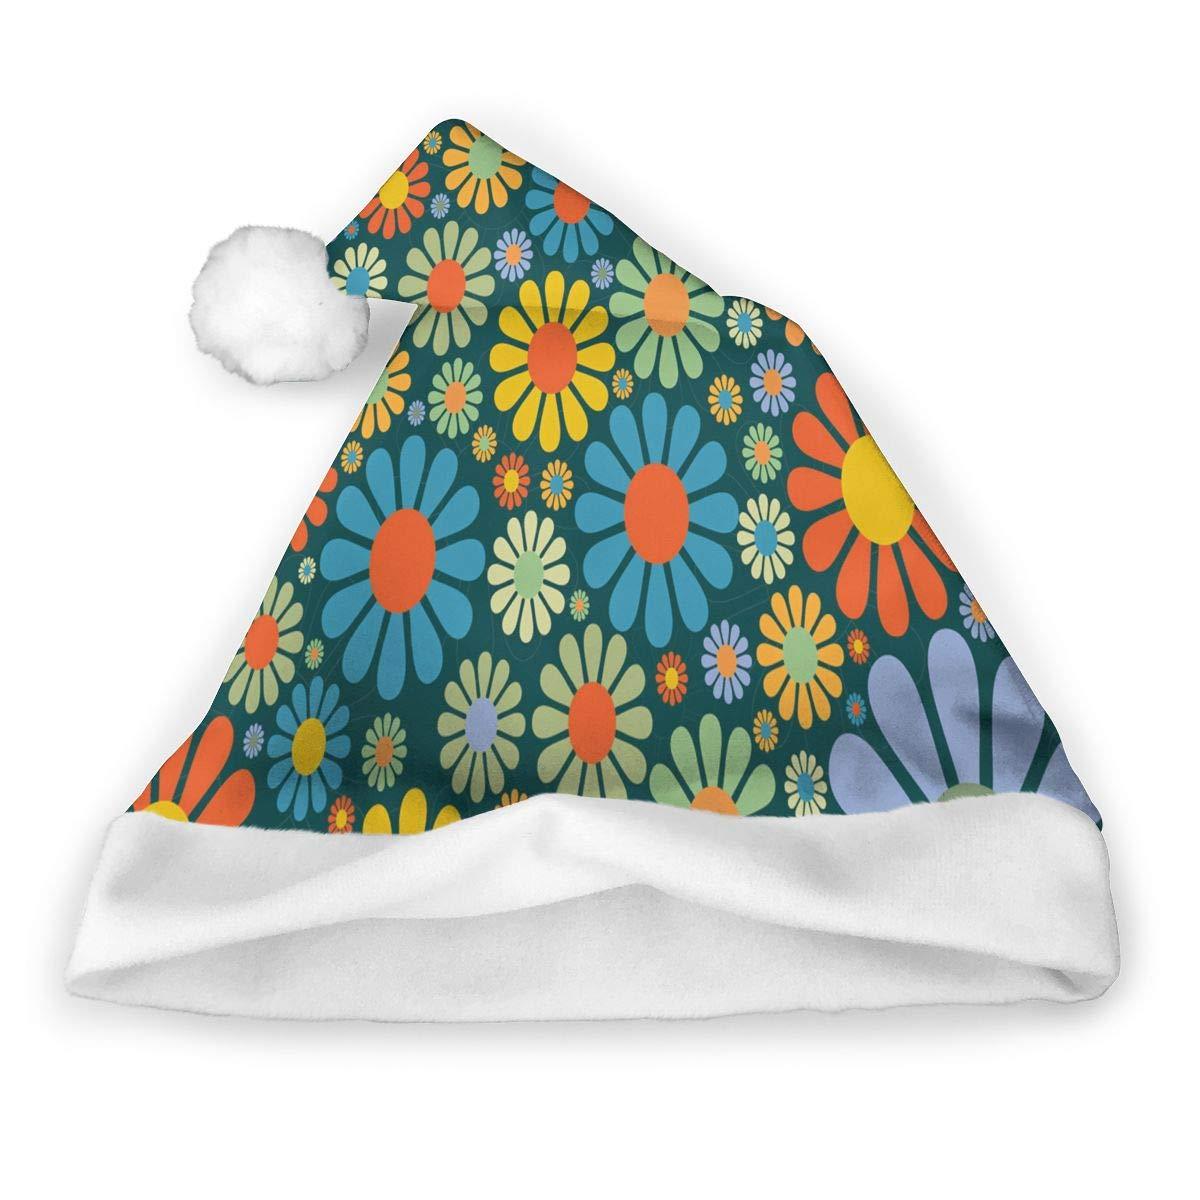 ZHOUSUN 2 PCS Decor Christmas Hat Flowers Grass Mushrooms Santa Xmas Cap Costume Decorations